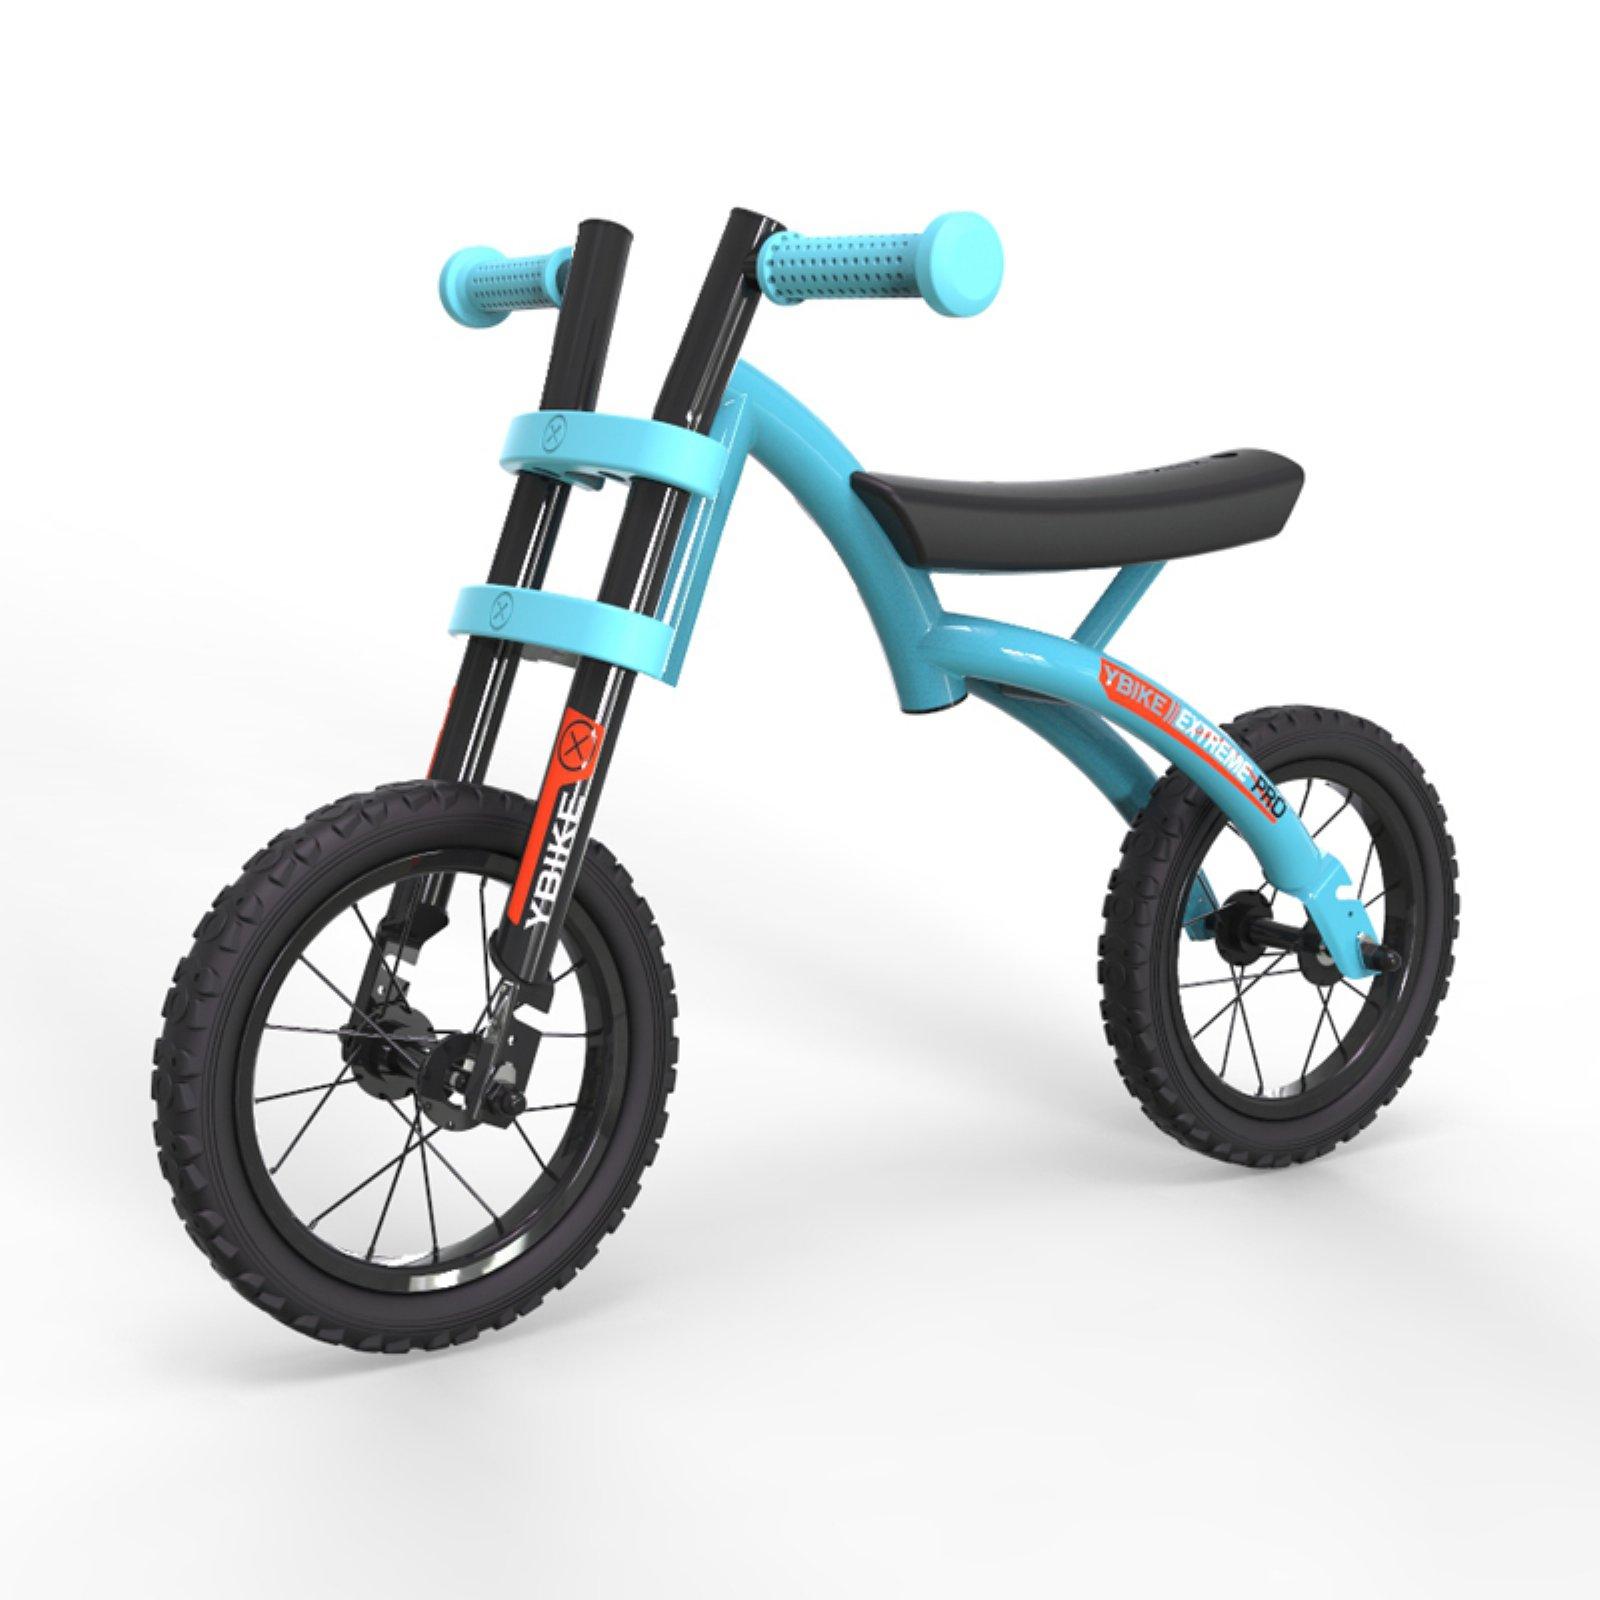 Ybike Session All-Terrain Adjustable Kid's Balance Bike, Blue